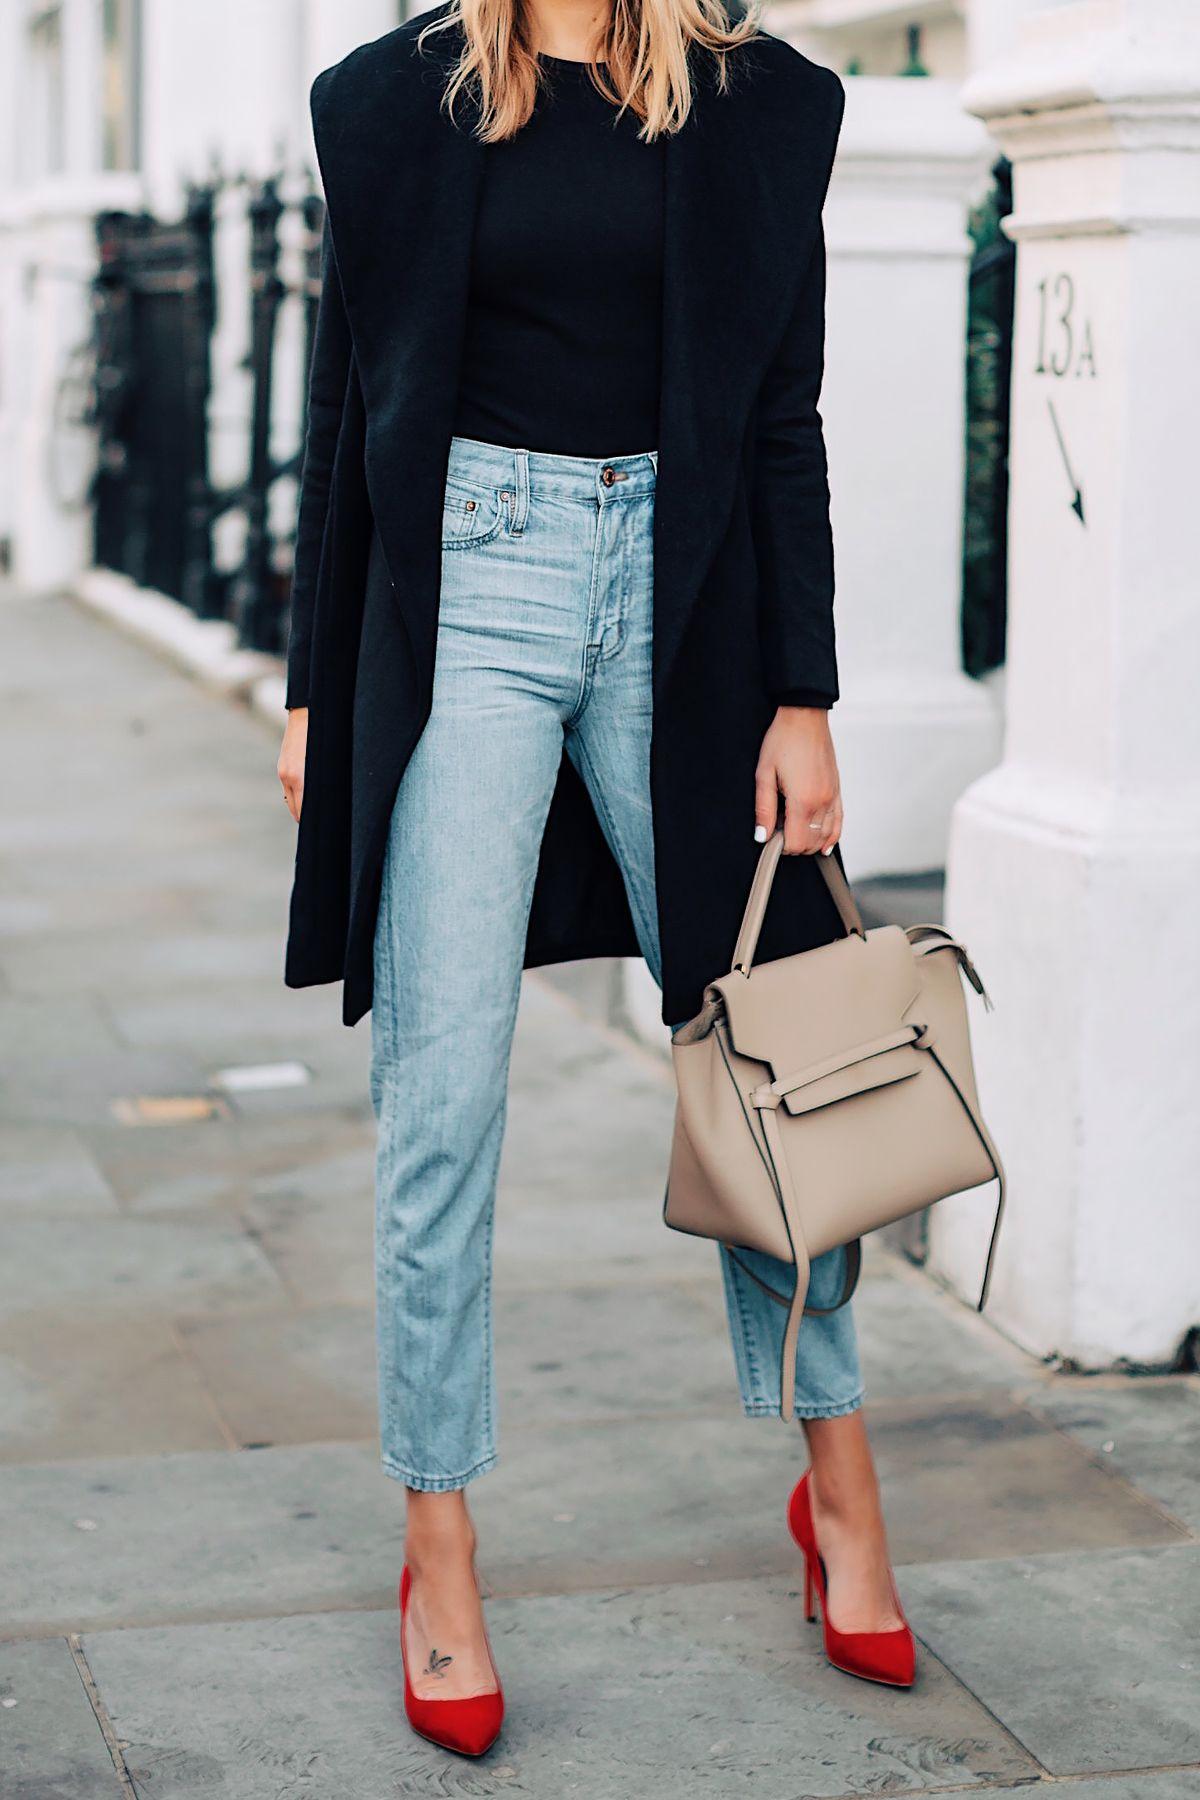 Woman Wearing Ann Taylor Black Wrap Coat Black Top Denim High Rise Jeans  Red Pumps Celine Mini Belt Bag Fashion Jackson San Diego Fashion Blogger  London ... a2d172a1a7e95